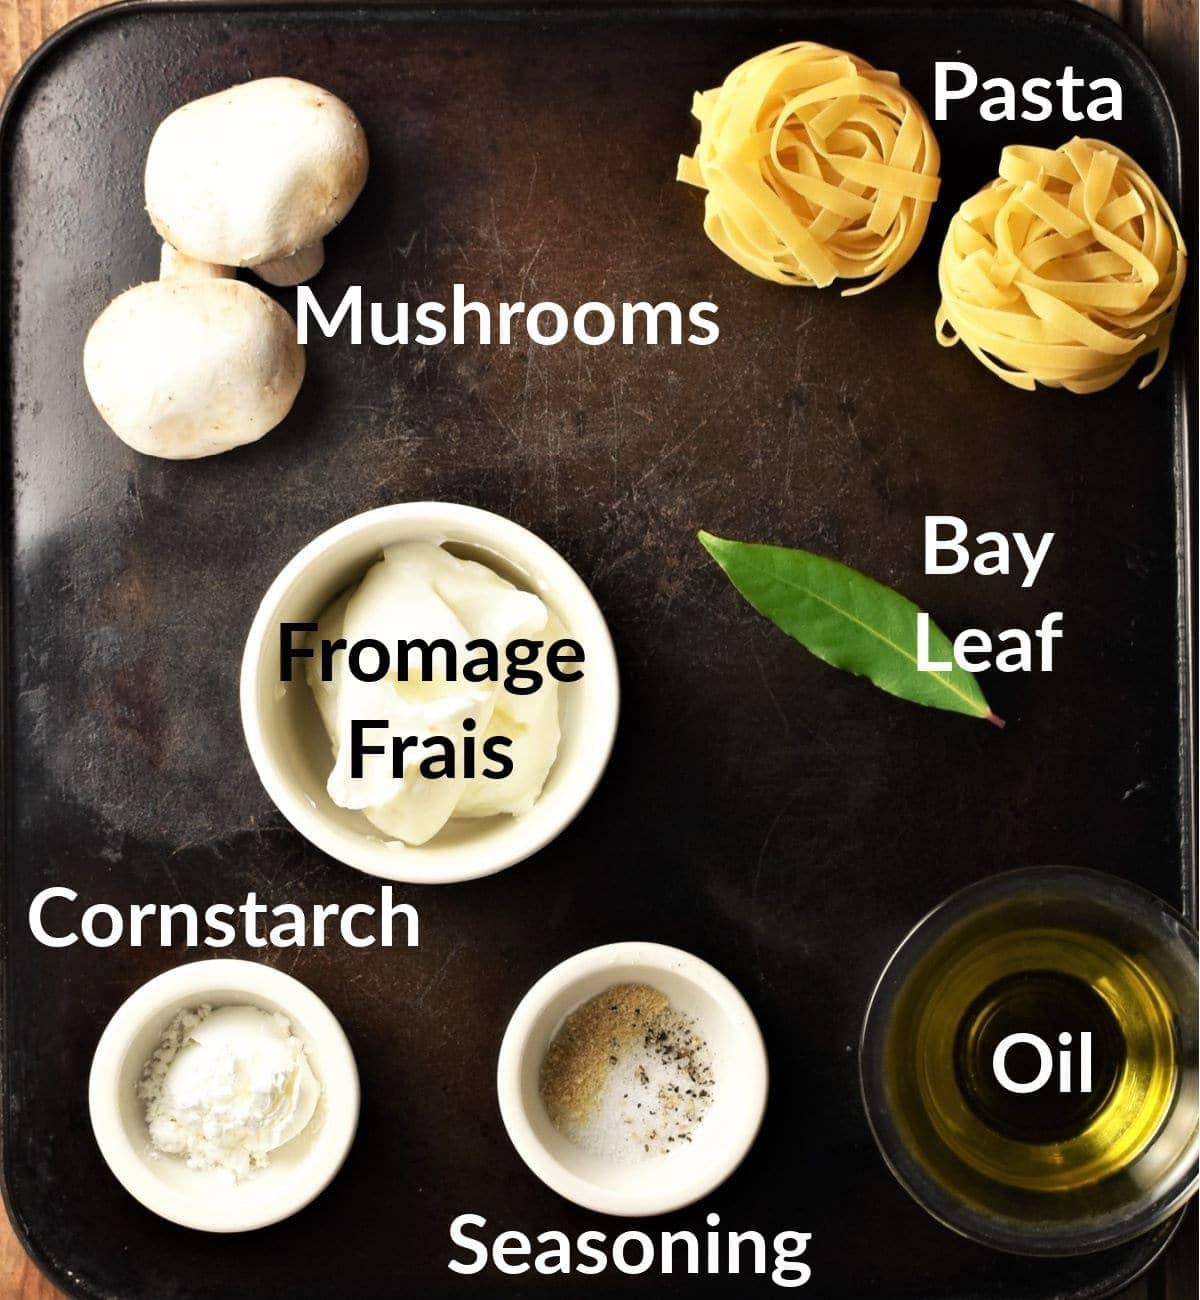 Mushroom pasta ingredients in individual dishes.